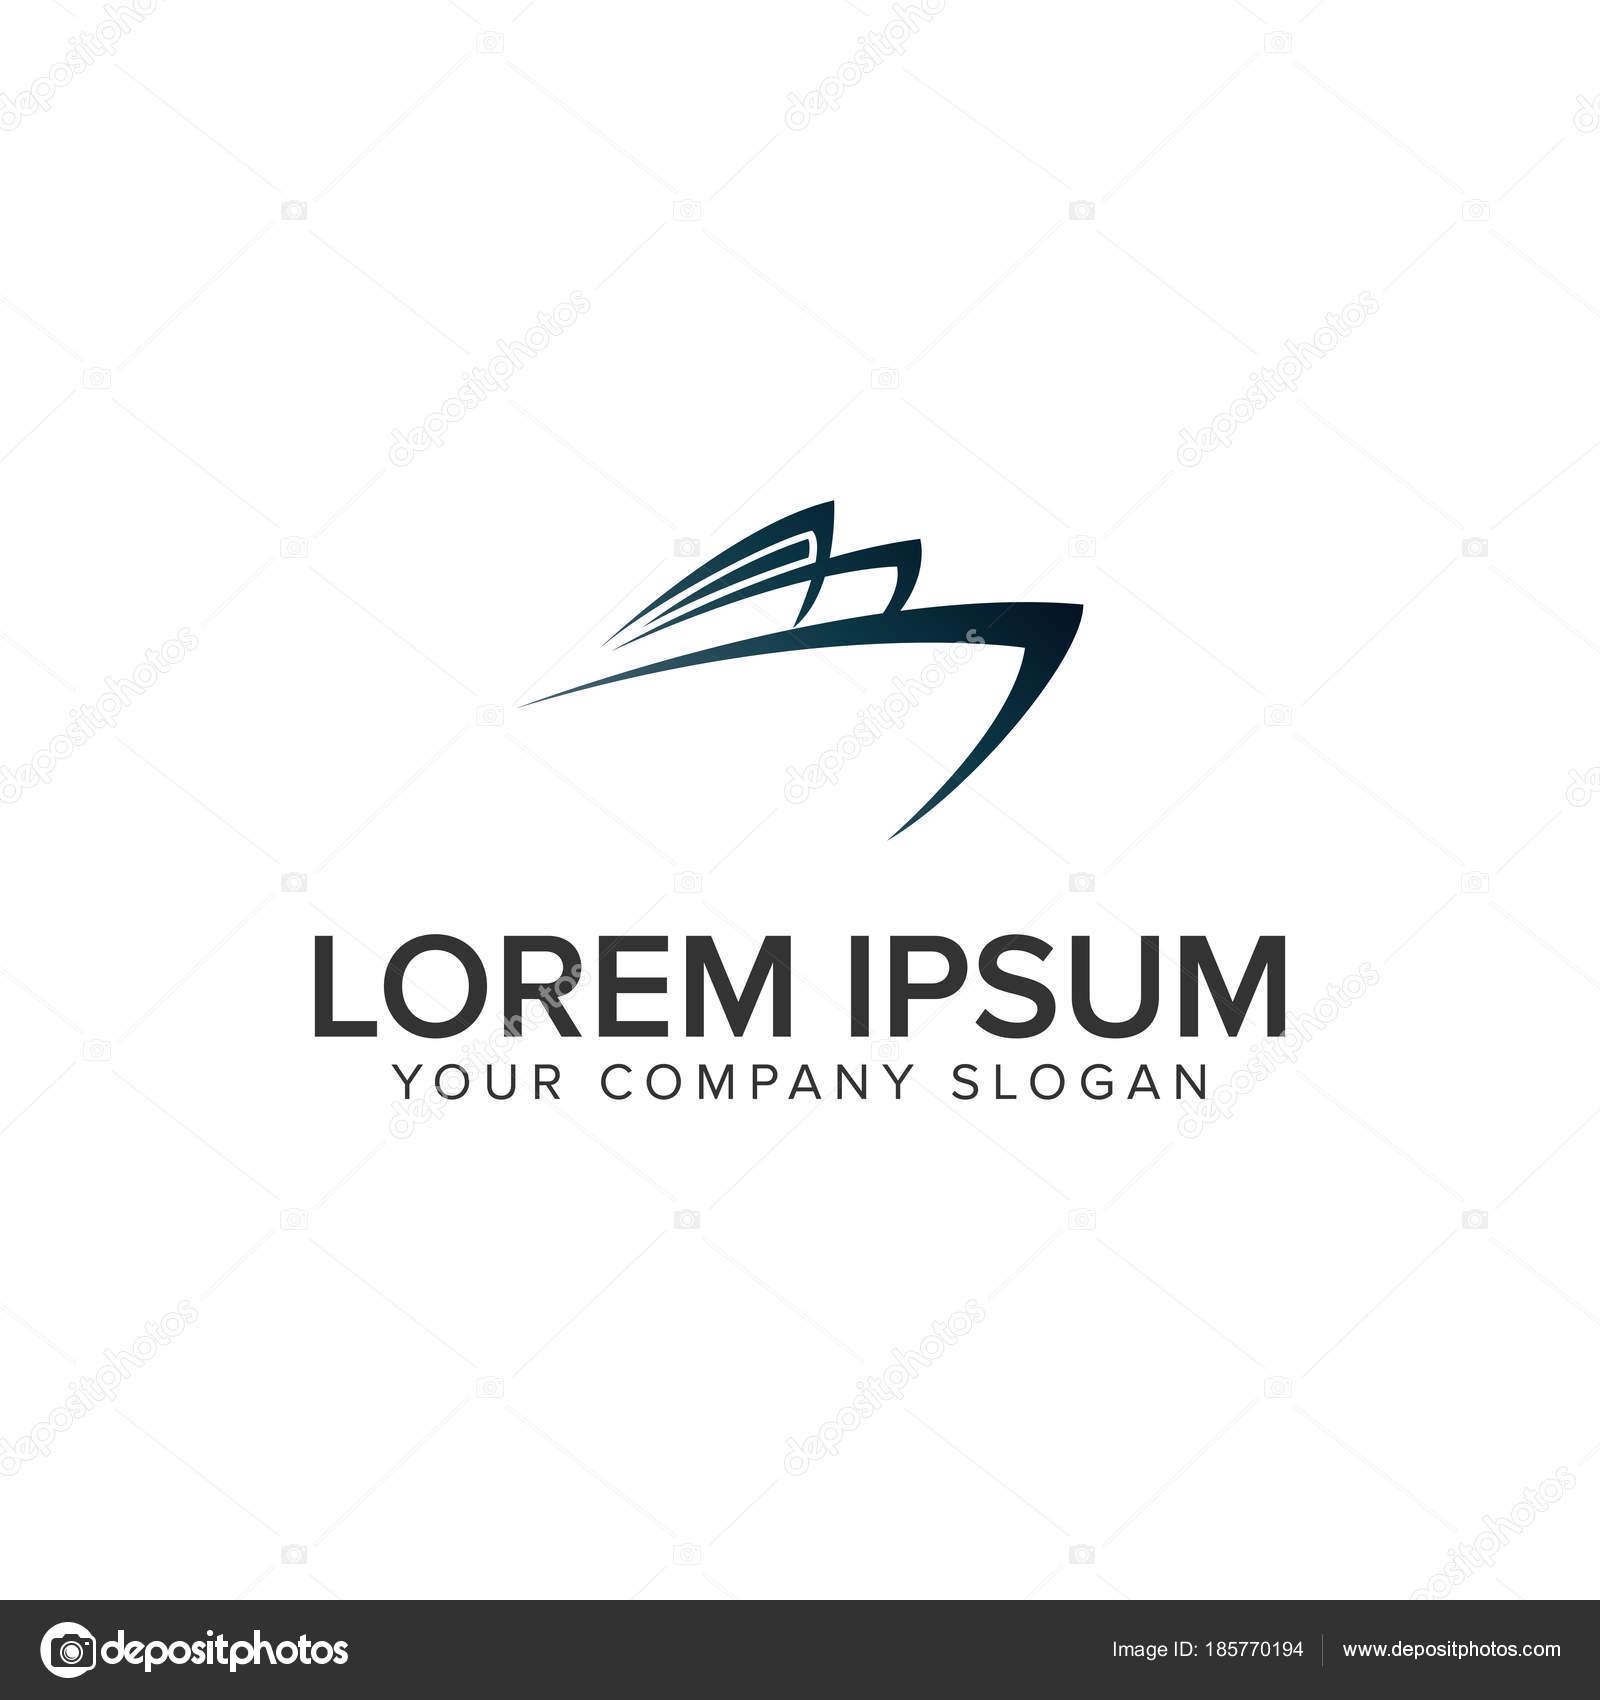 Boat logo design concept template  — Stock Vector © oriu007 #185770194